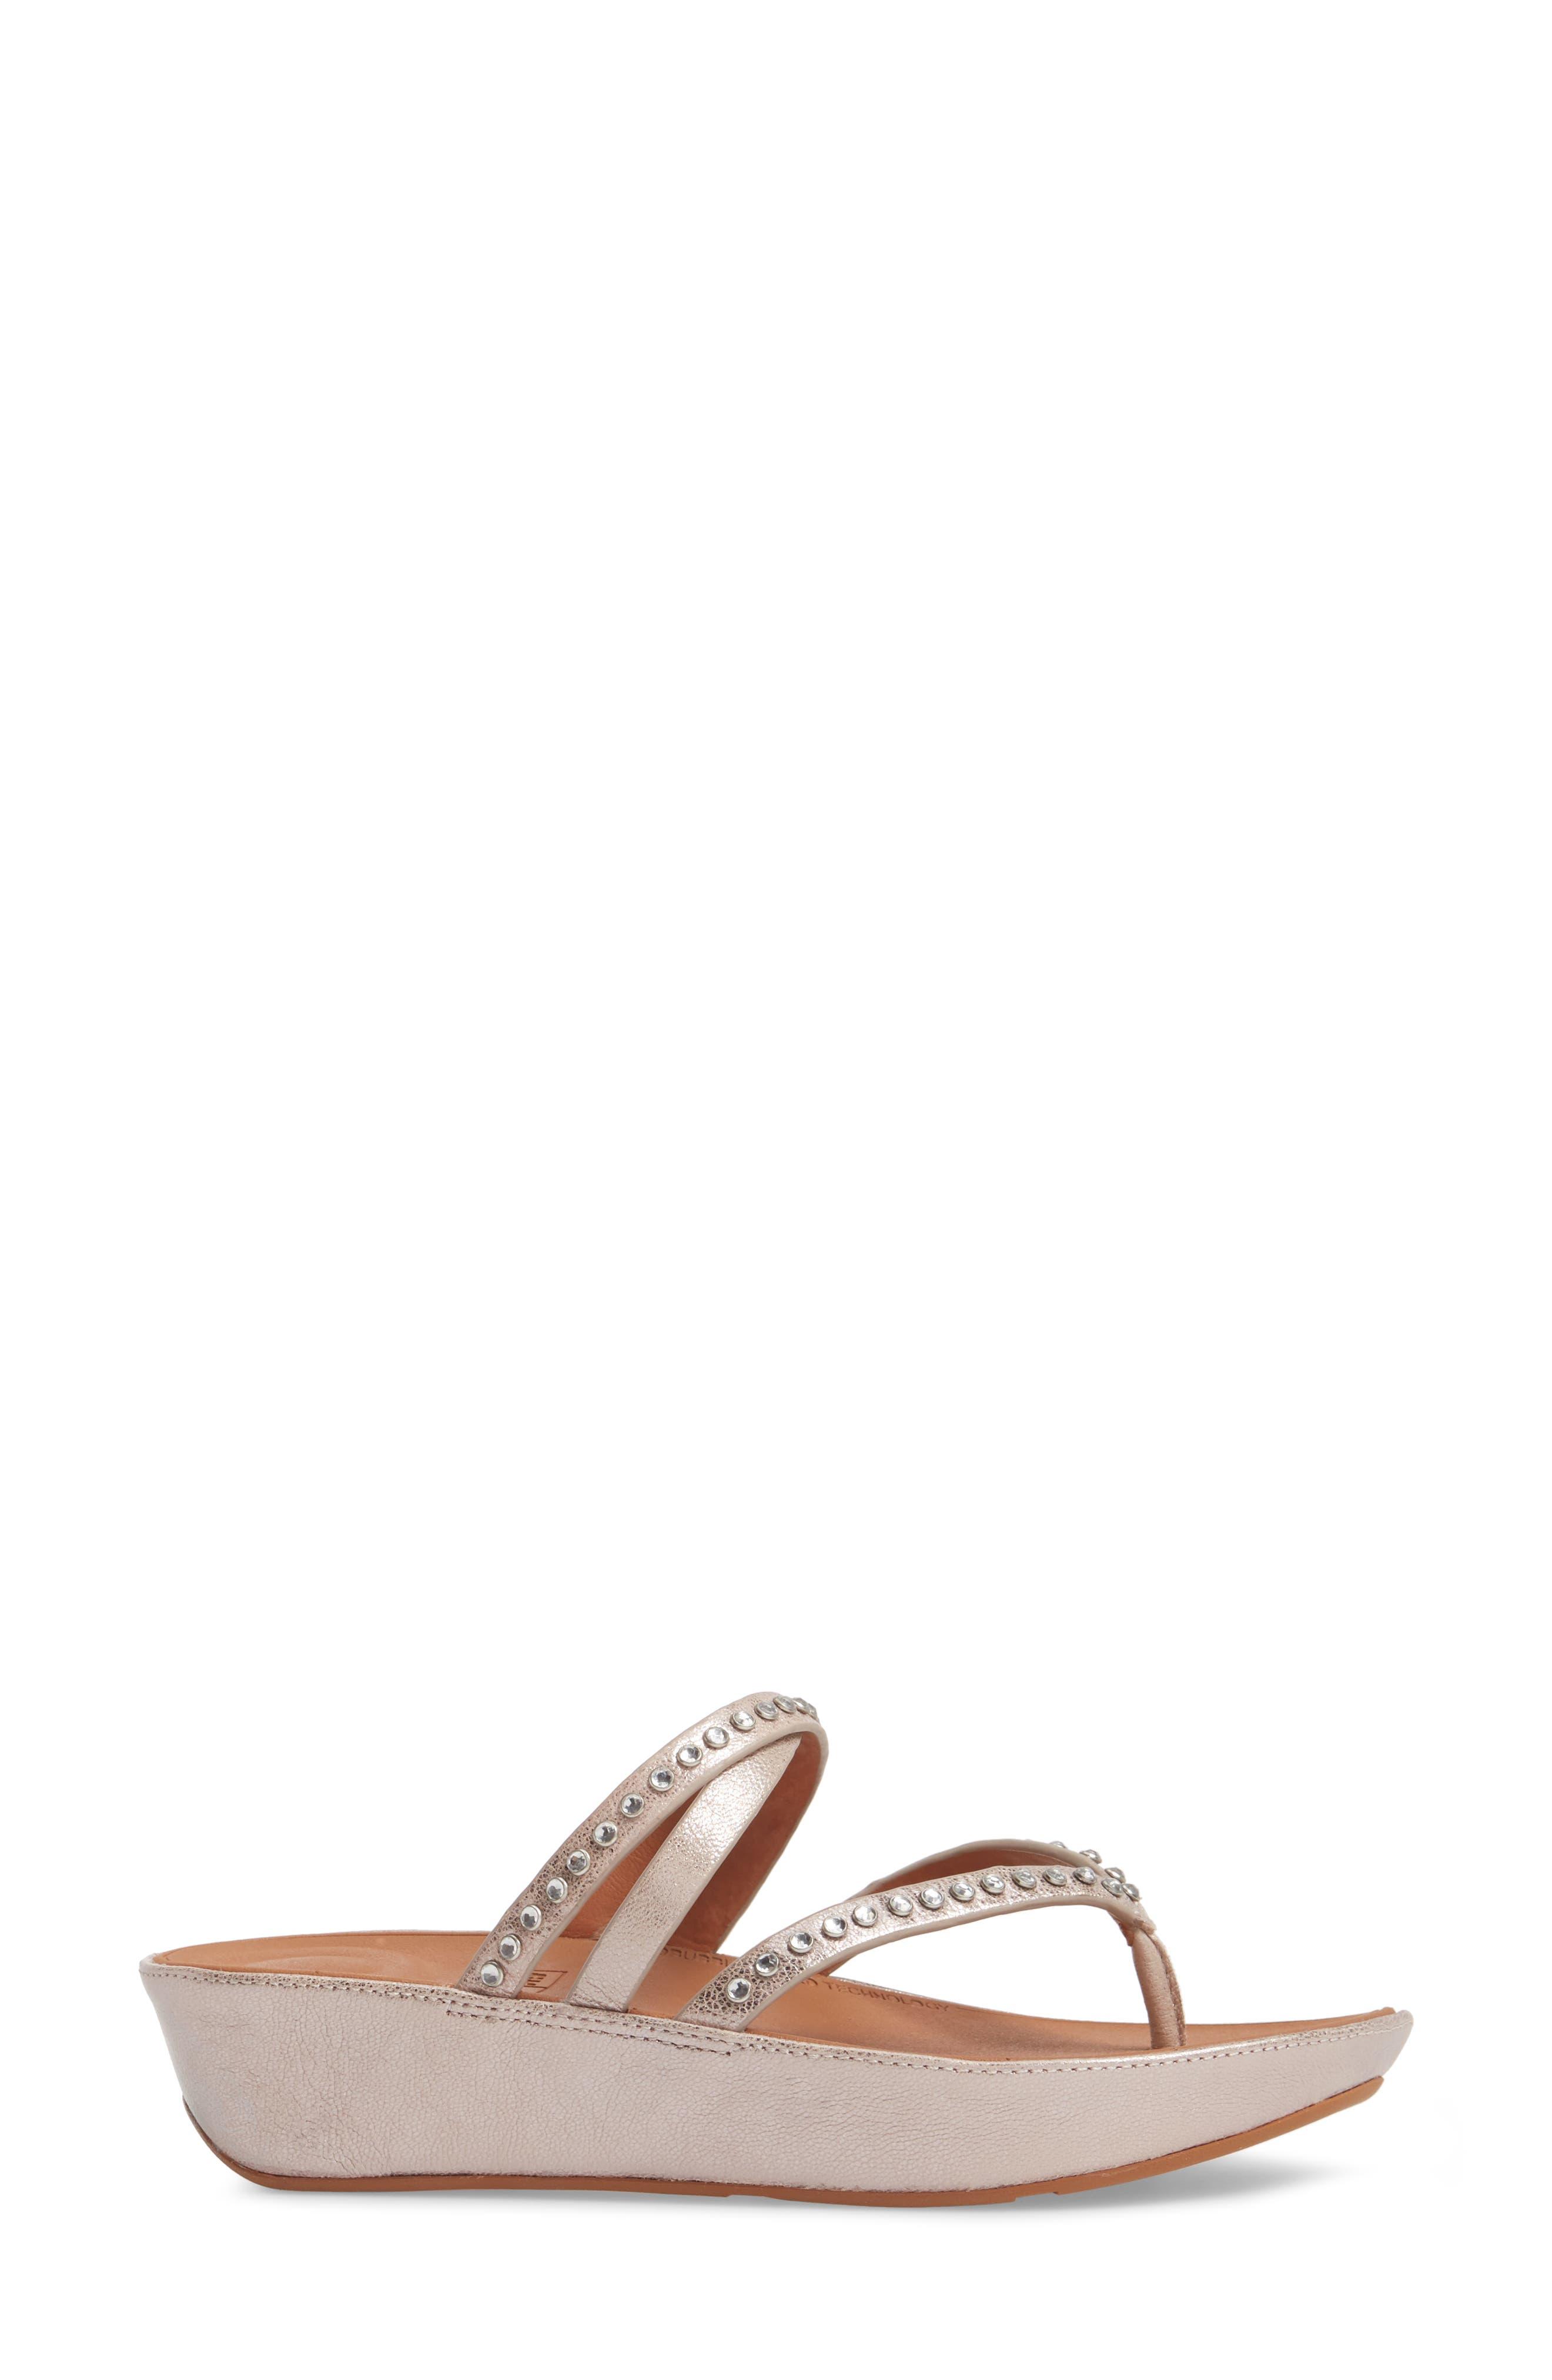 Linny Embellished Slide Sandal,                             Alternate thumbnail 3, color,                             Blush/ Metallic Nude Leather